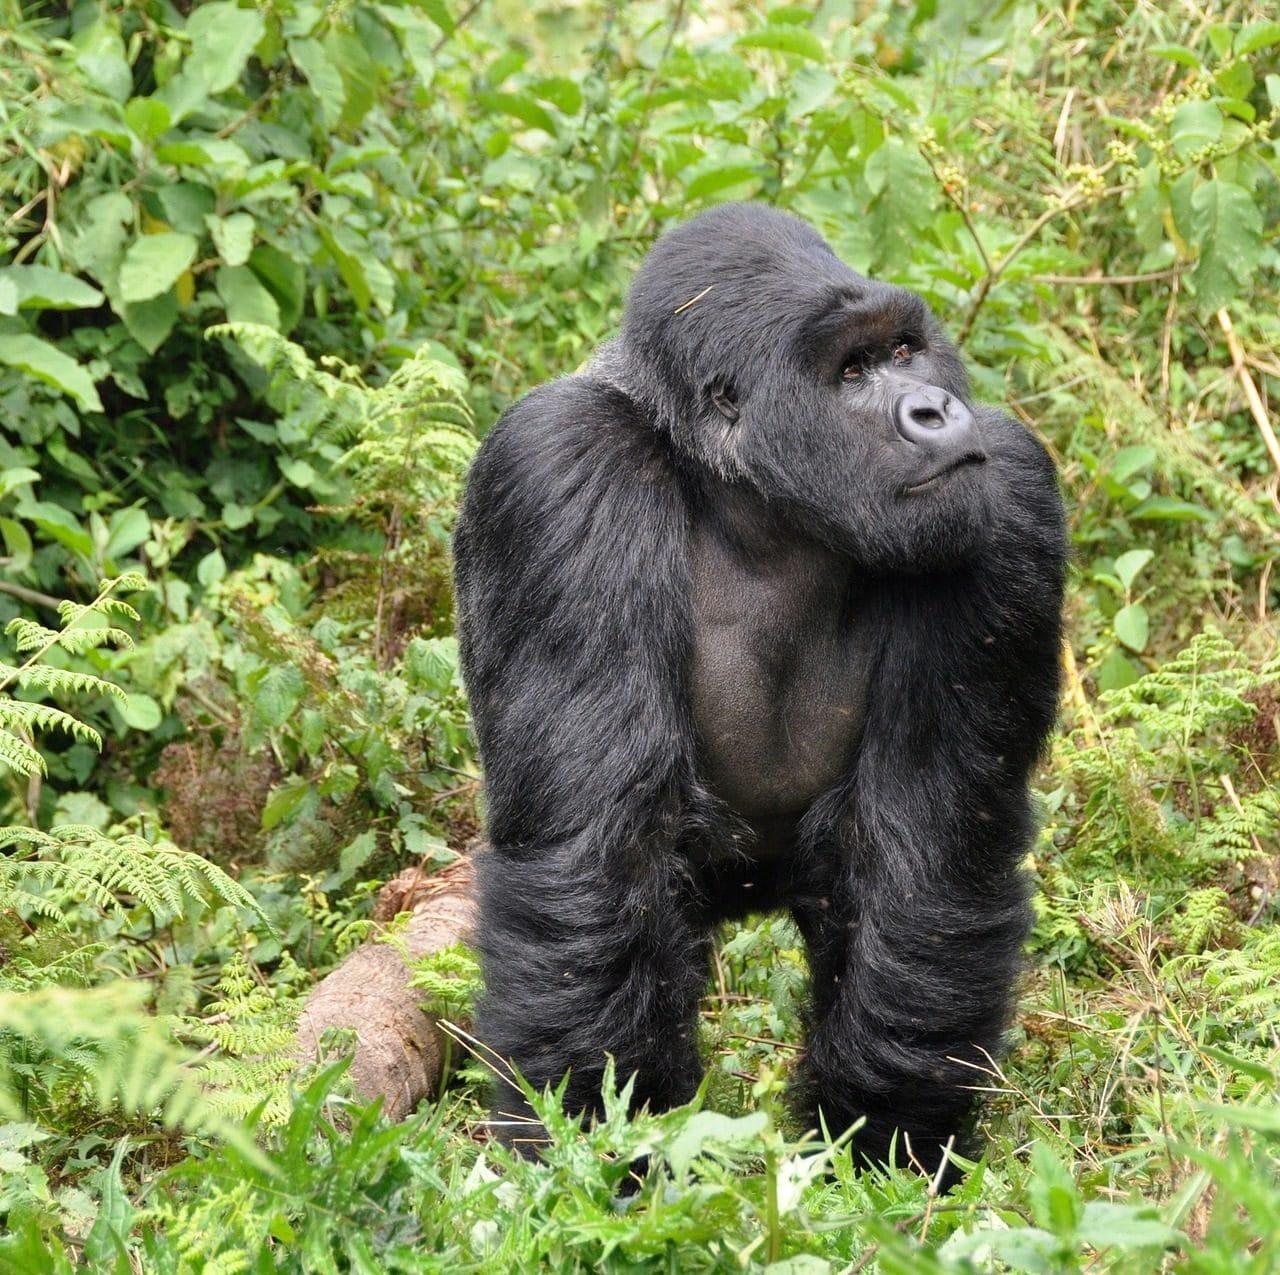 Gorilla and Chimp Trek in Rwanda Tour